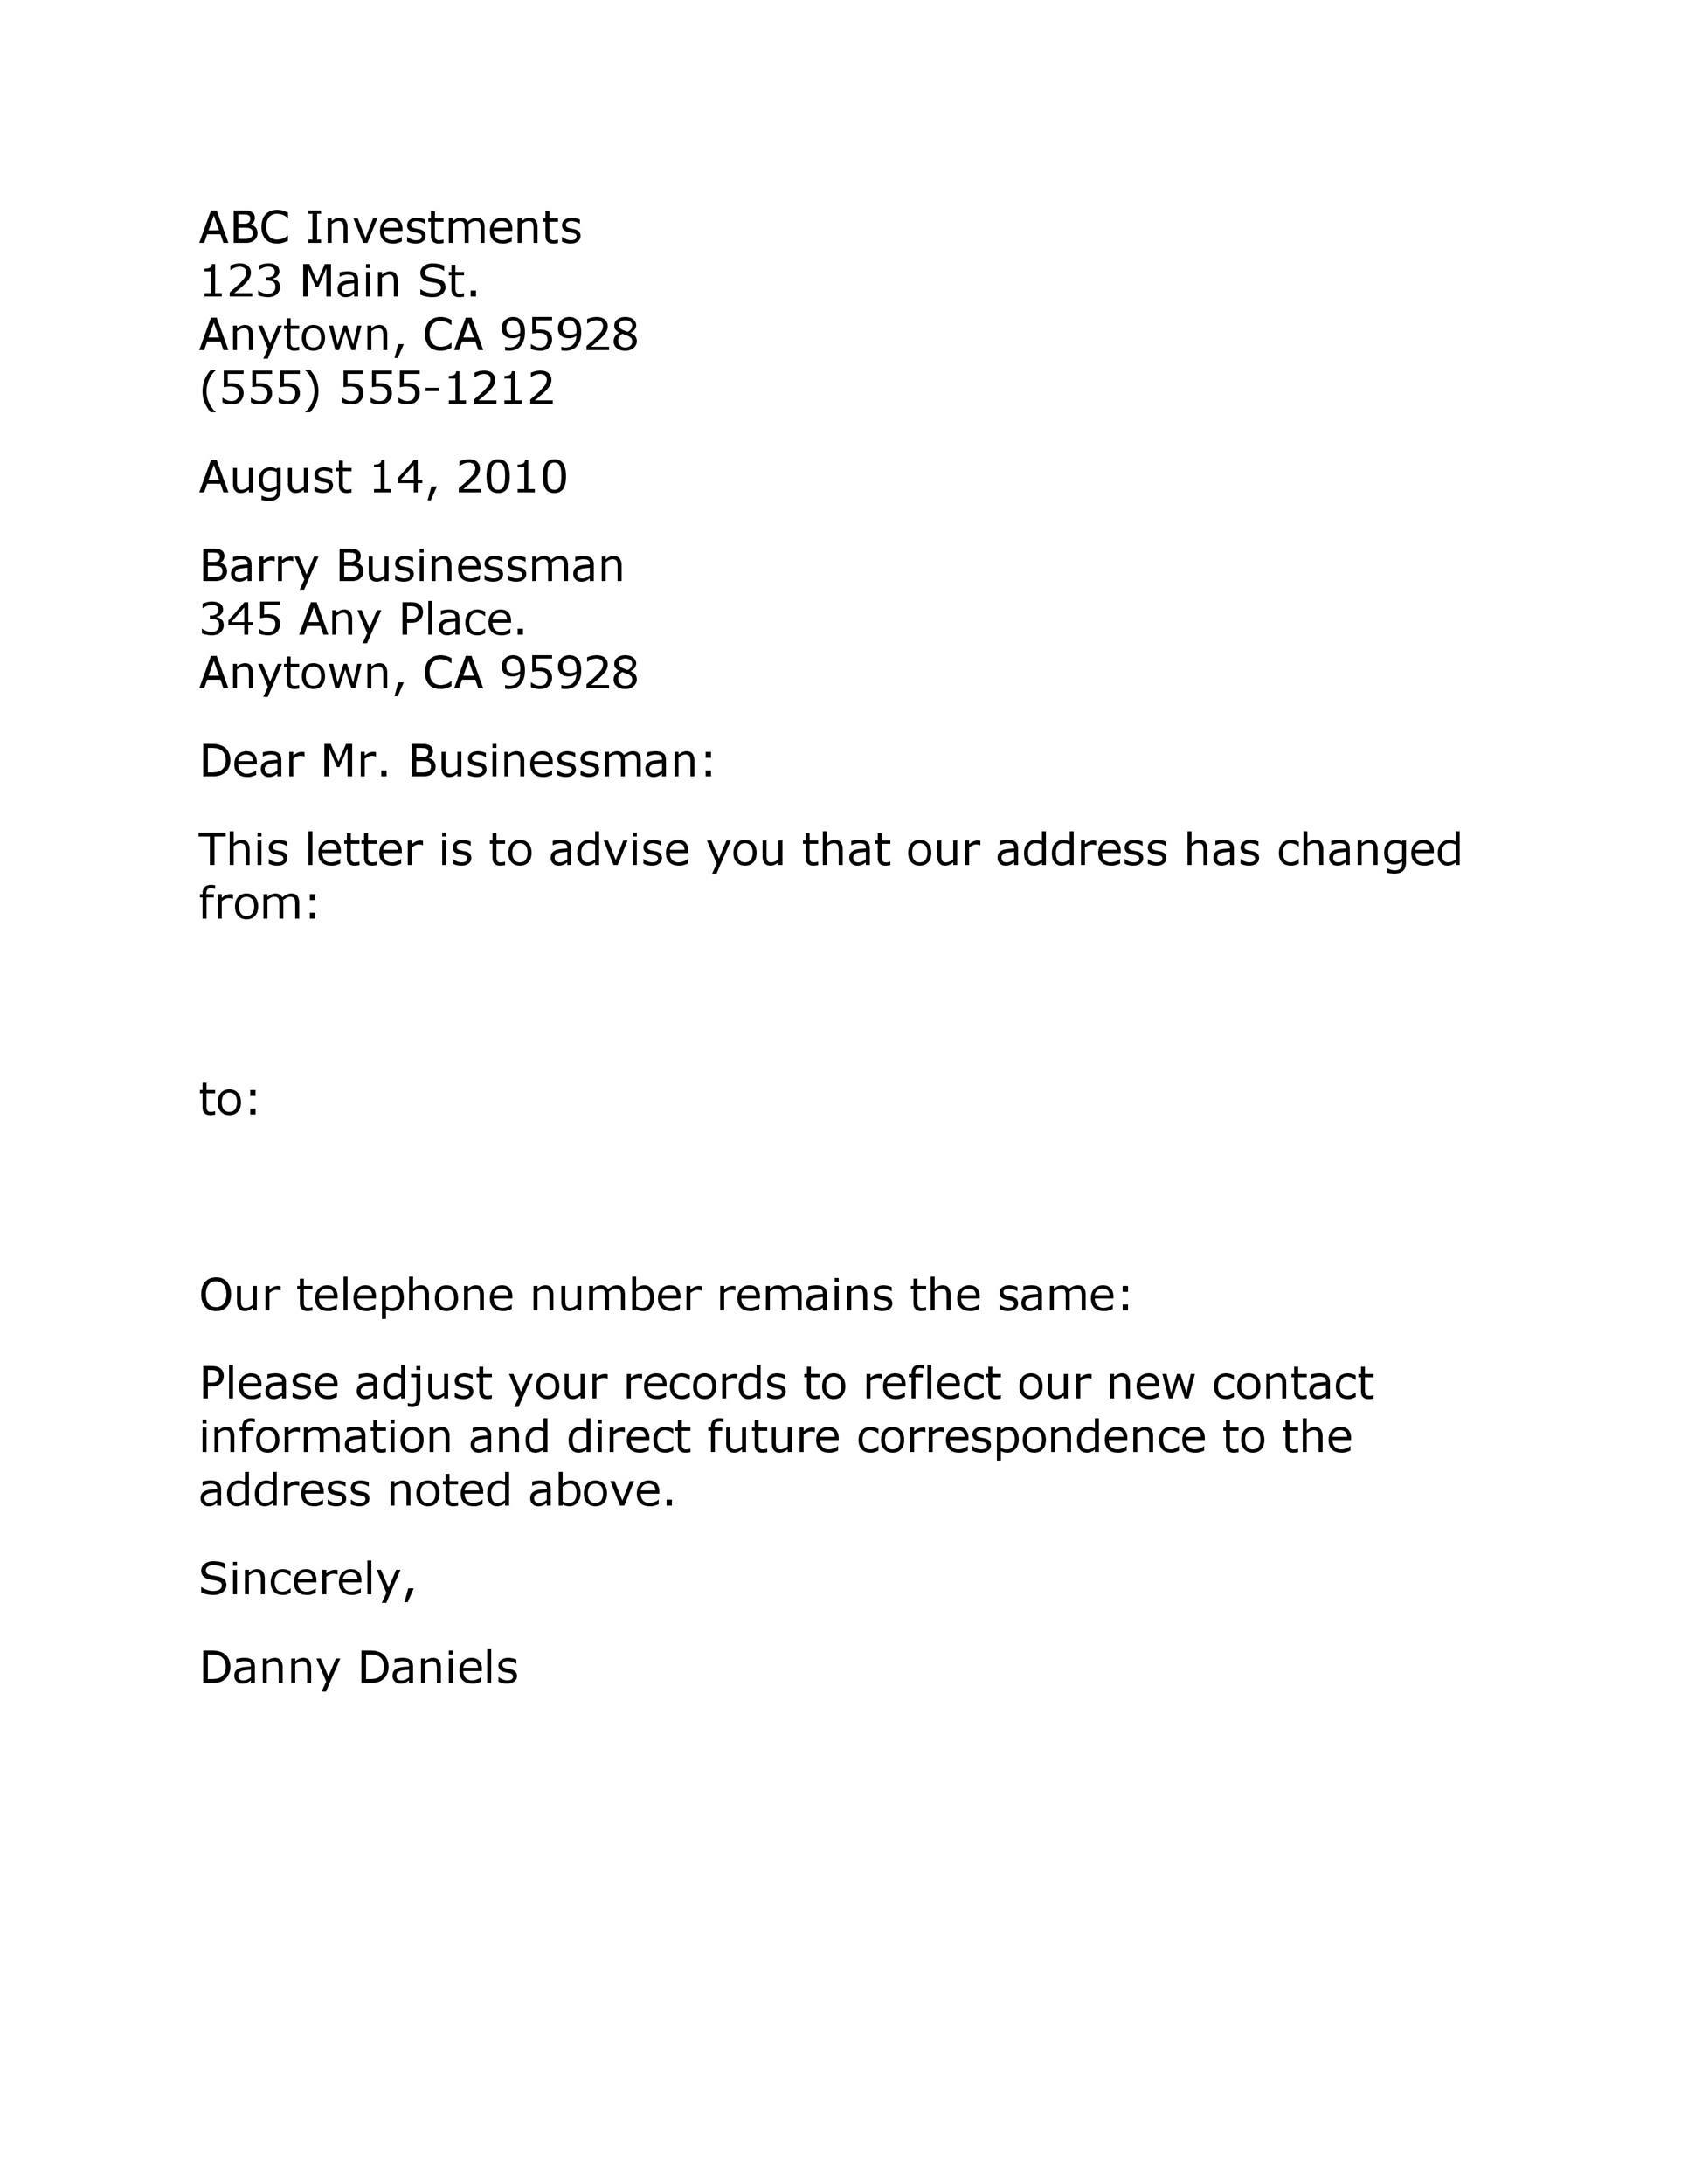 Free change of address letter 29